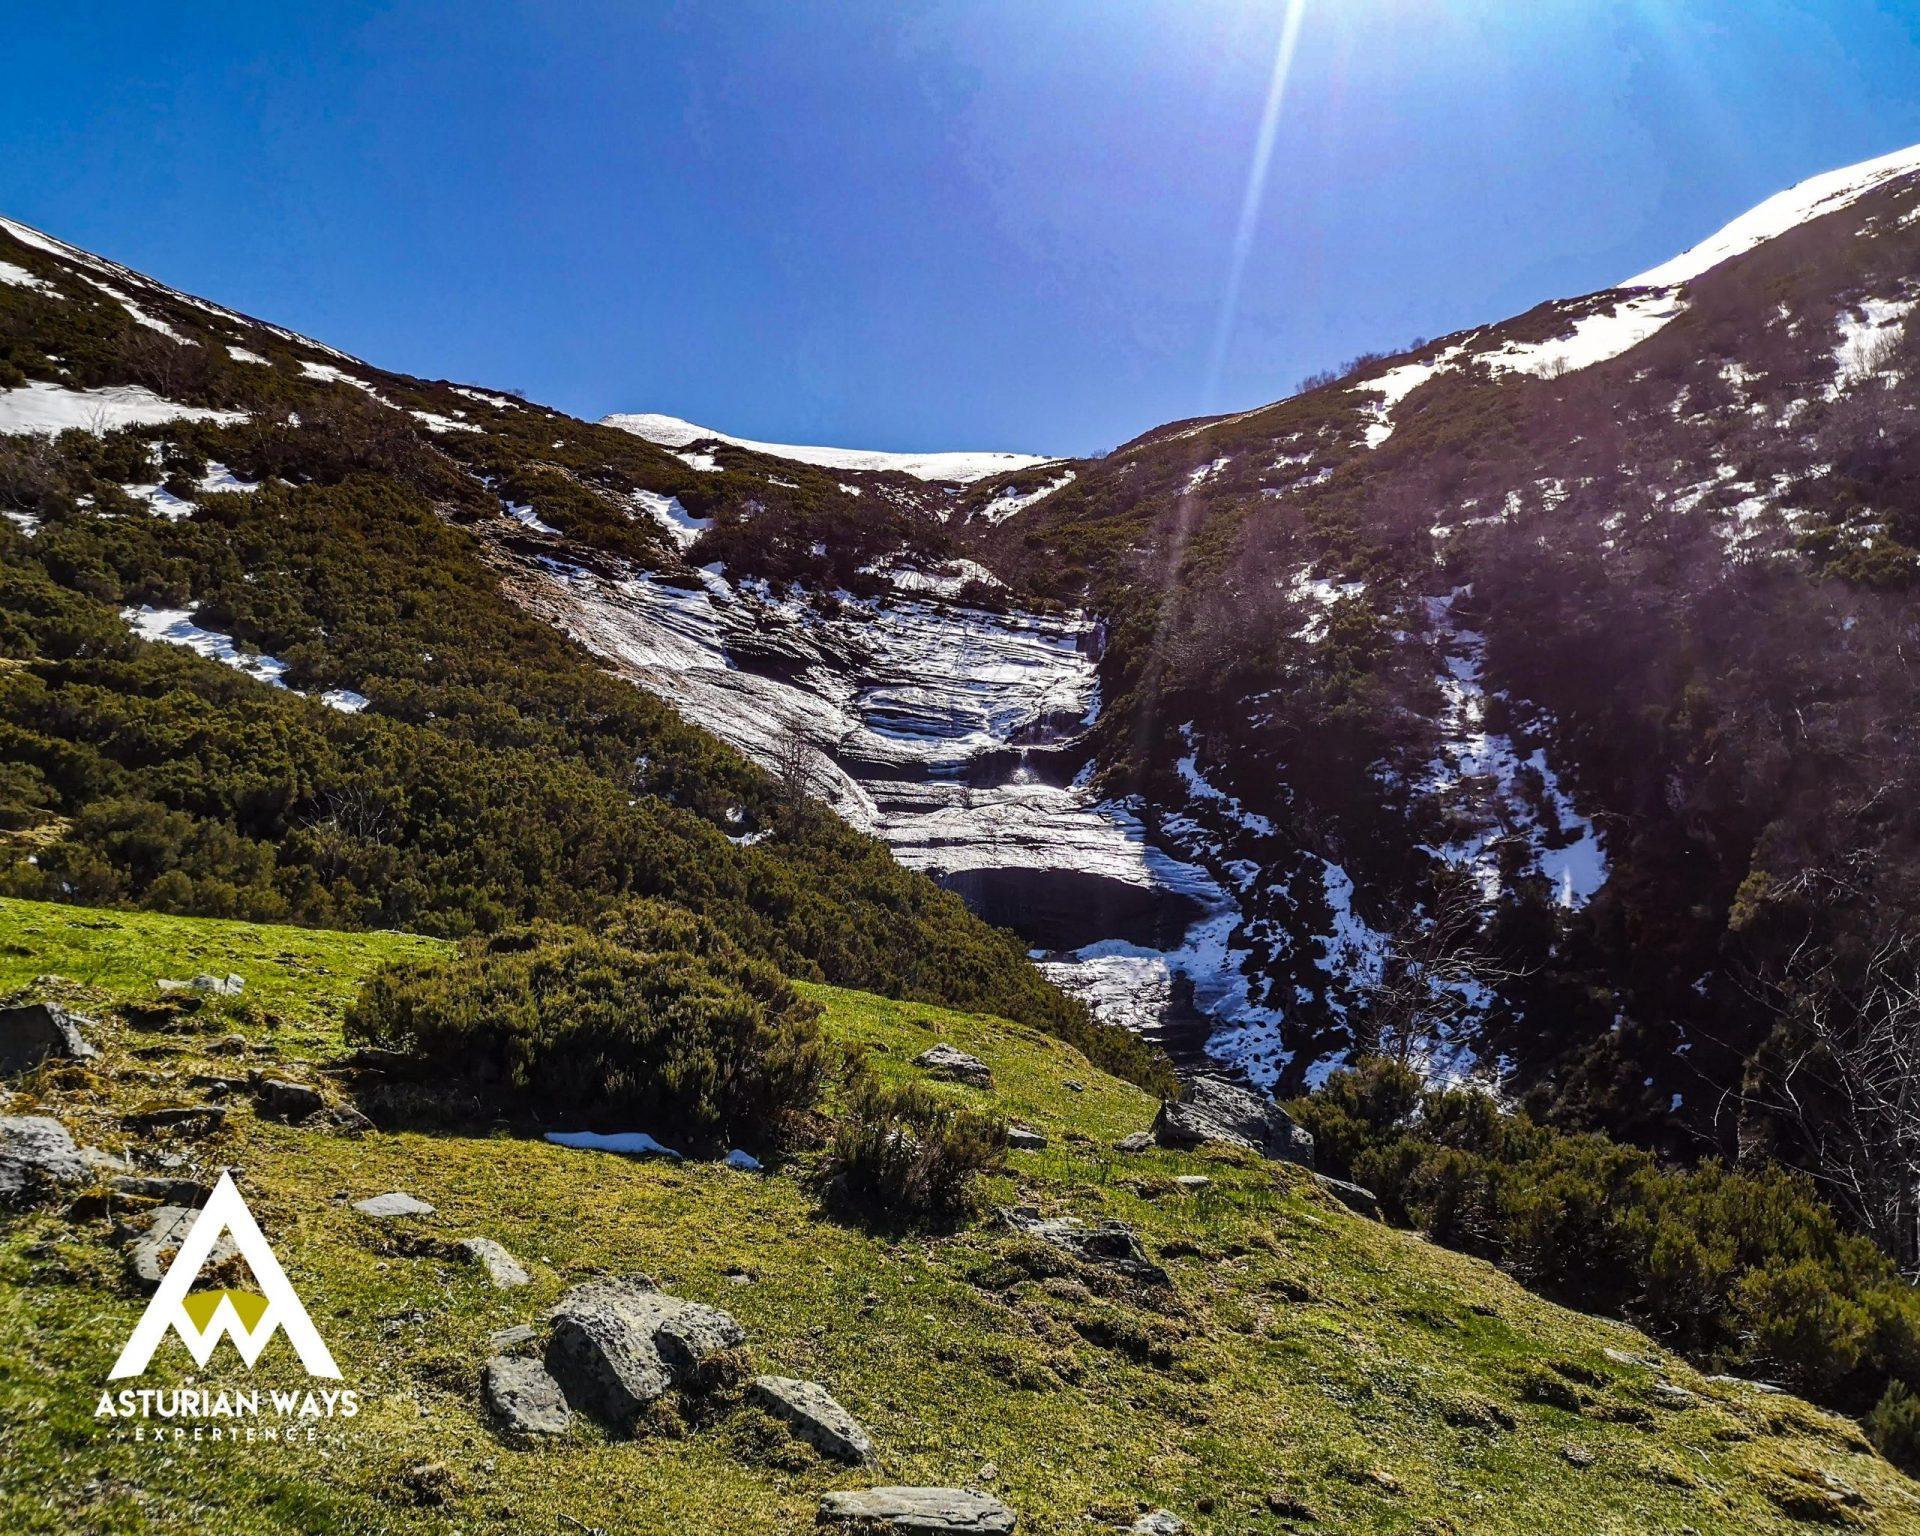 Cascada en el valle de Aller